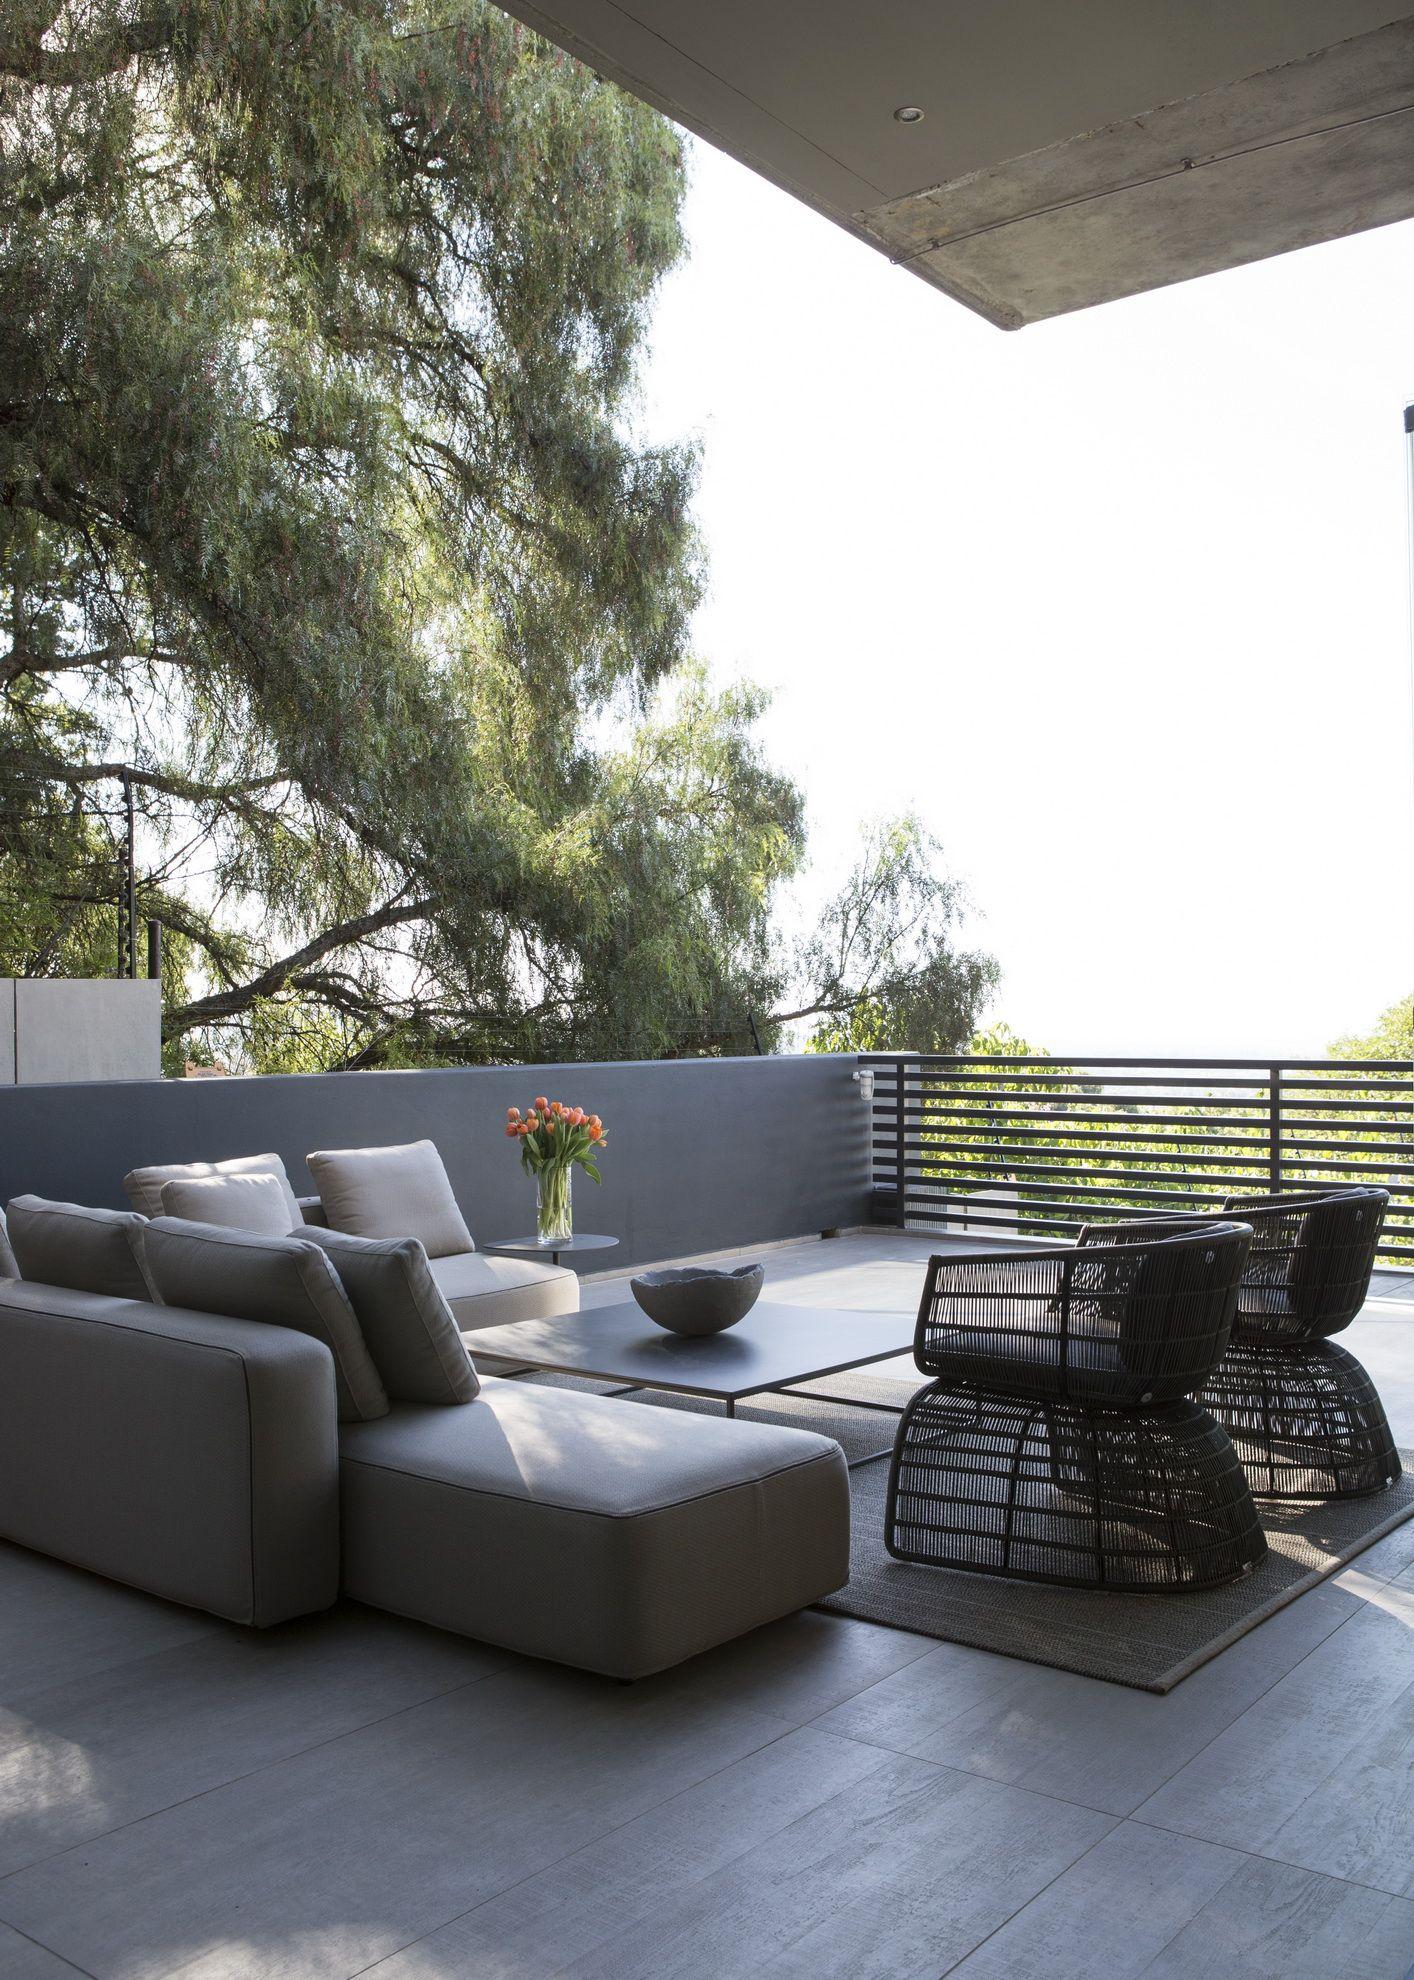 Concrete House | Outdoor Entertainment | Nico van der Meulen Architects #Design #Furniture #Outside #Contemporary